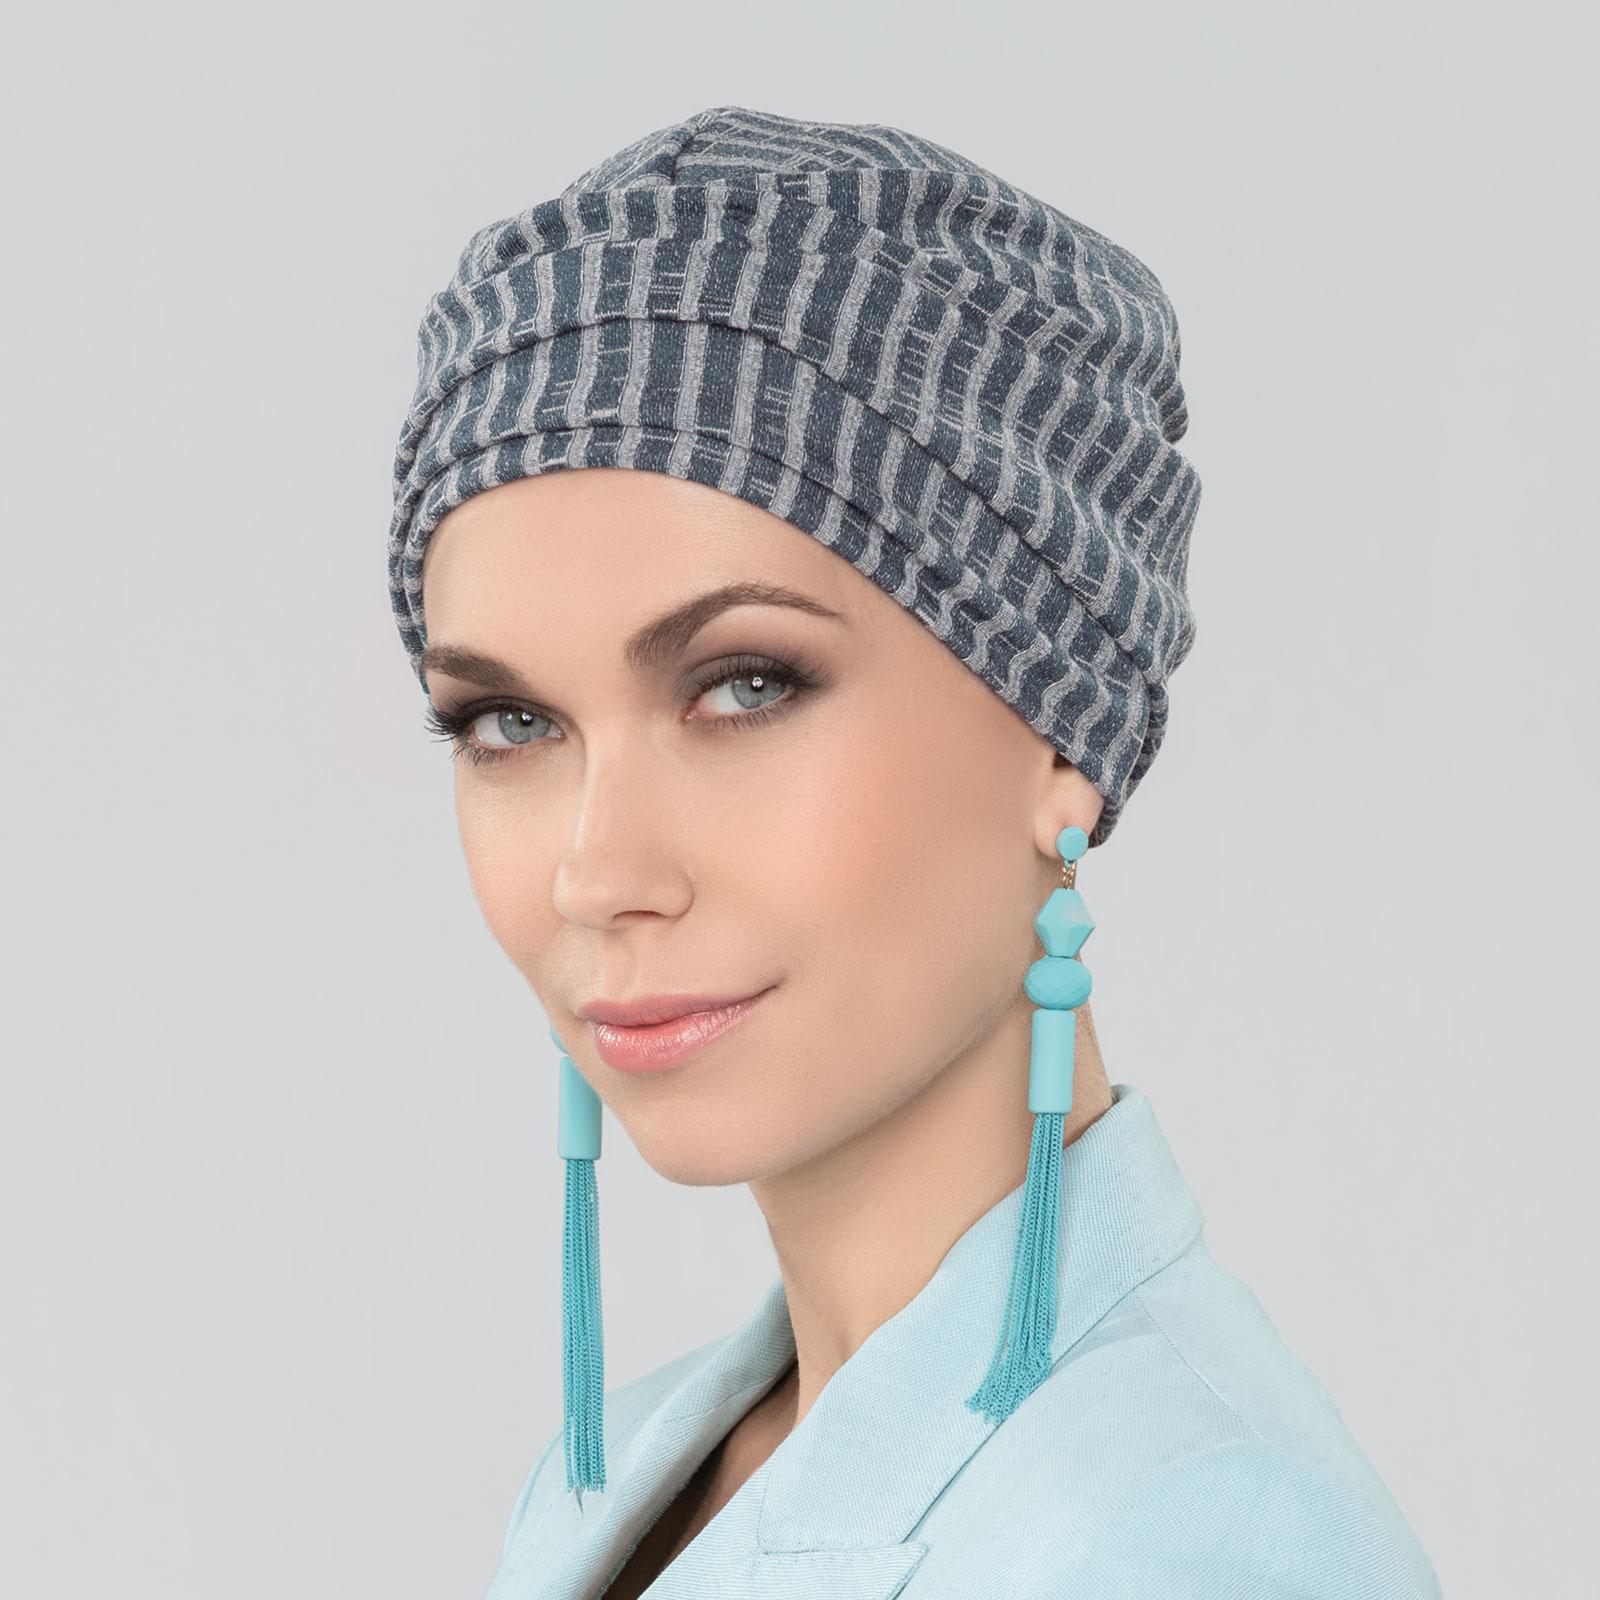 ellens headwear - evani